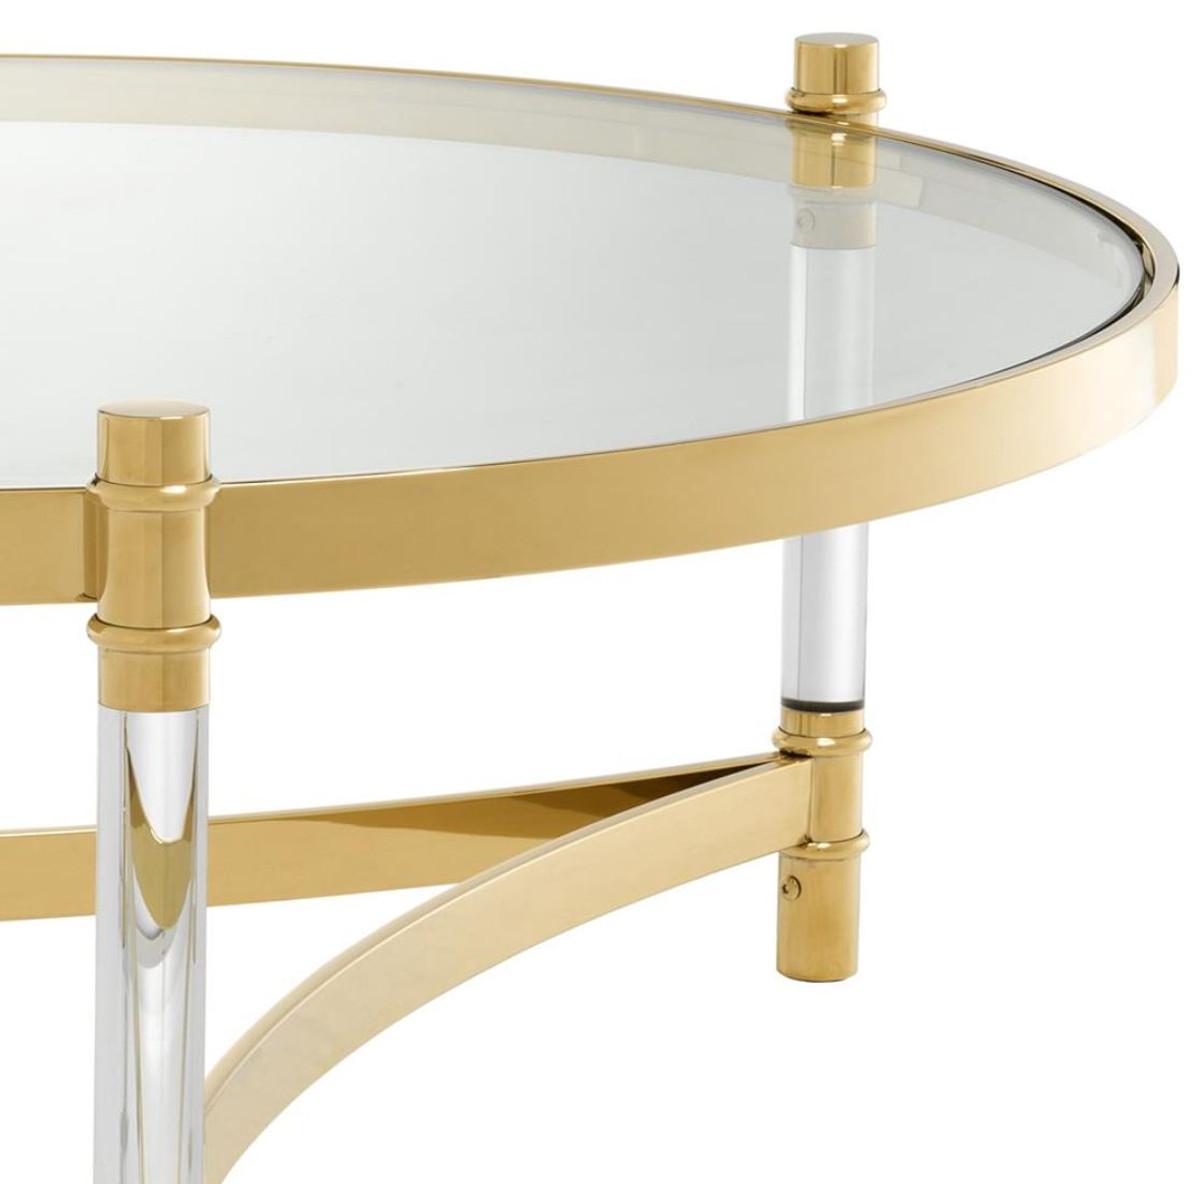 Casa padrino coffee table living room table gold ø 104 x h 43 cm